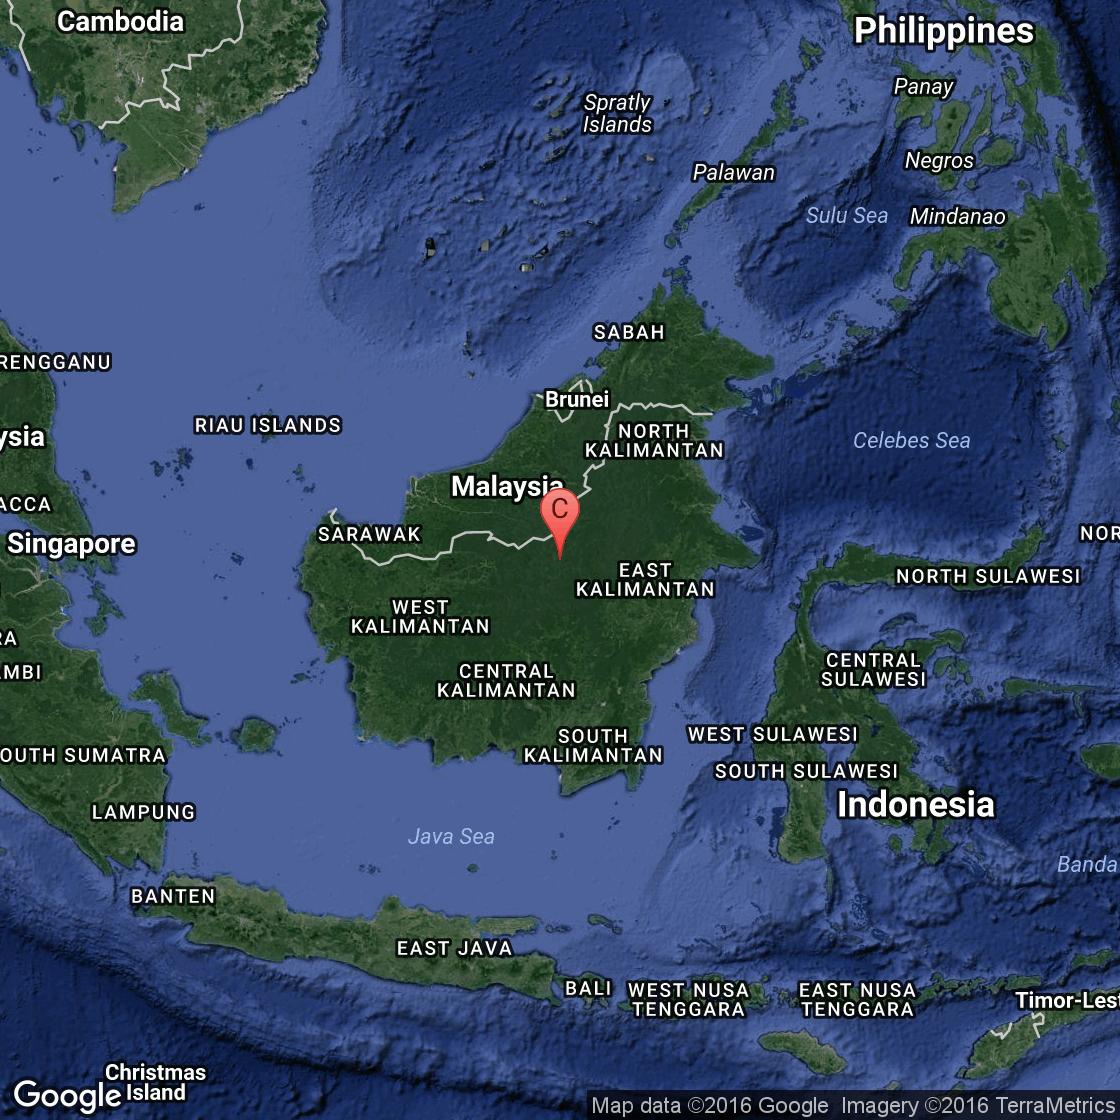 Borneo Island: Singles Travel To Borneo